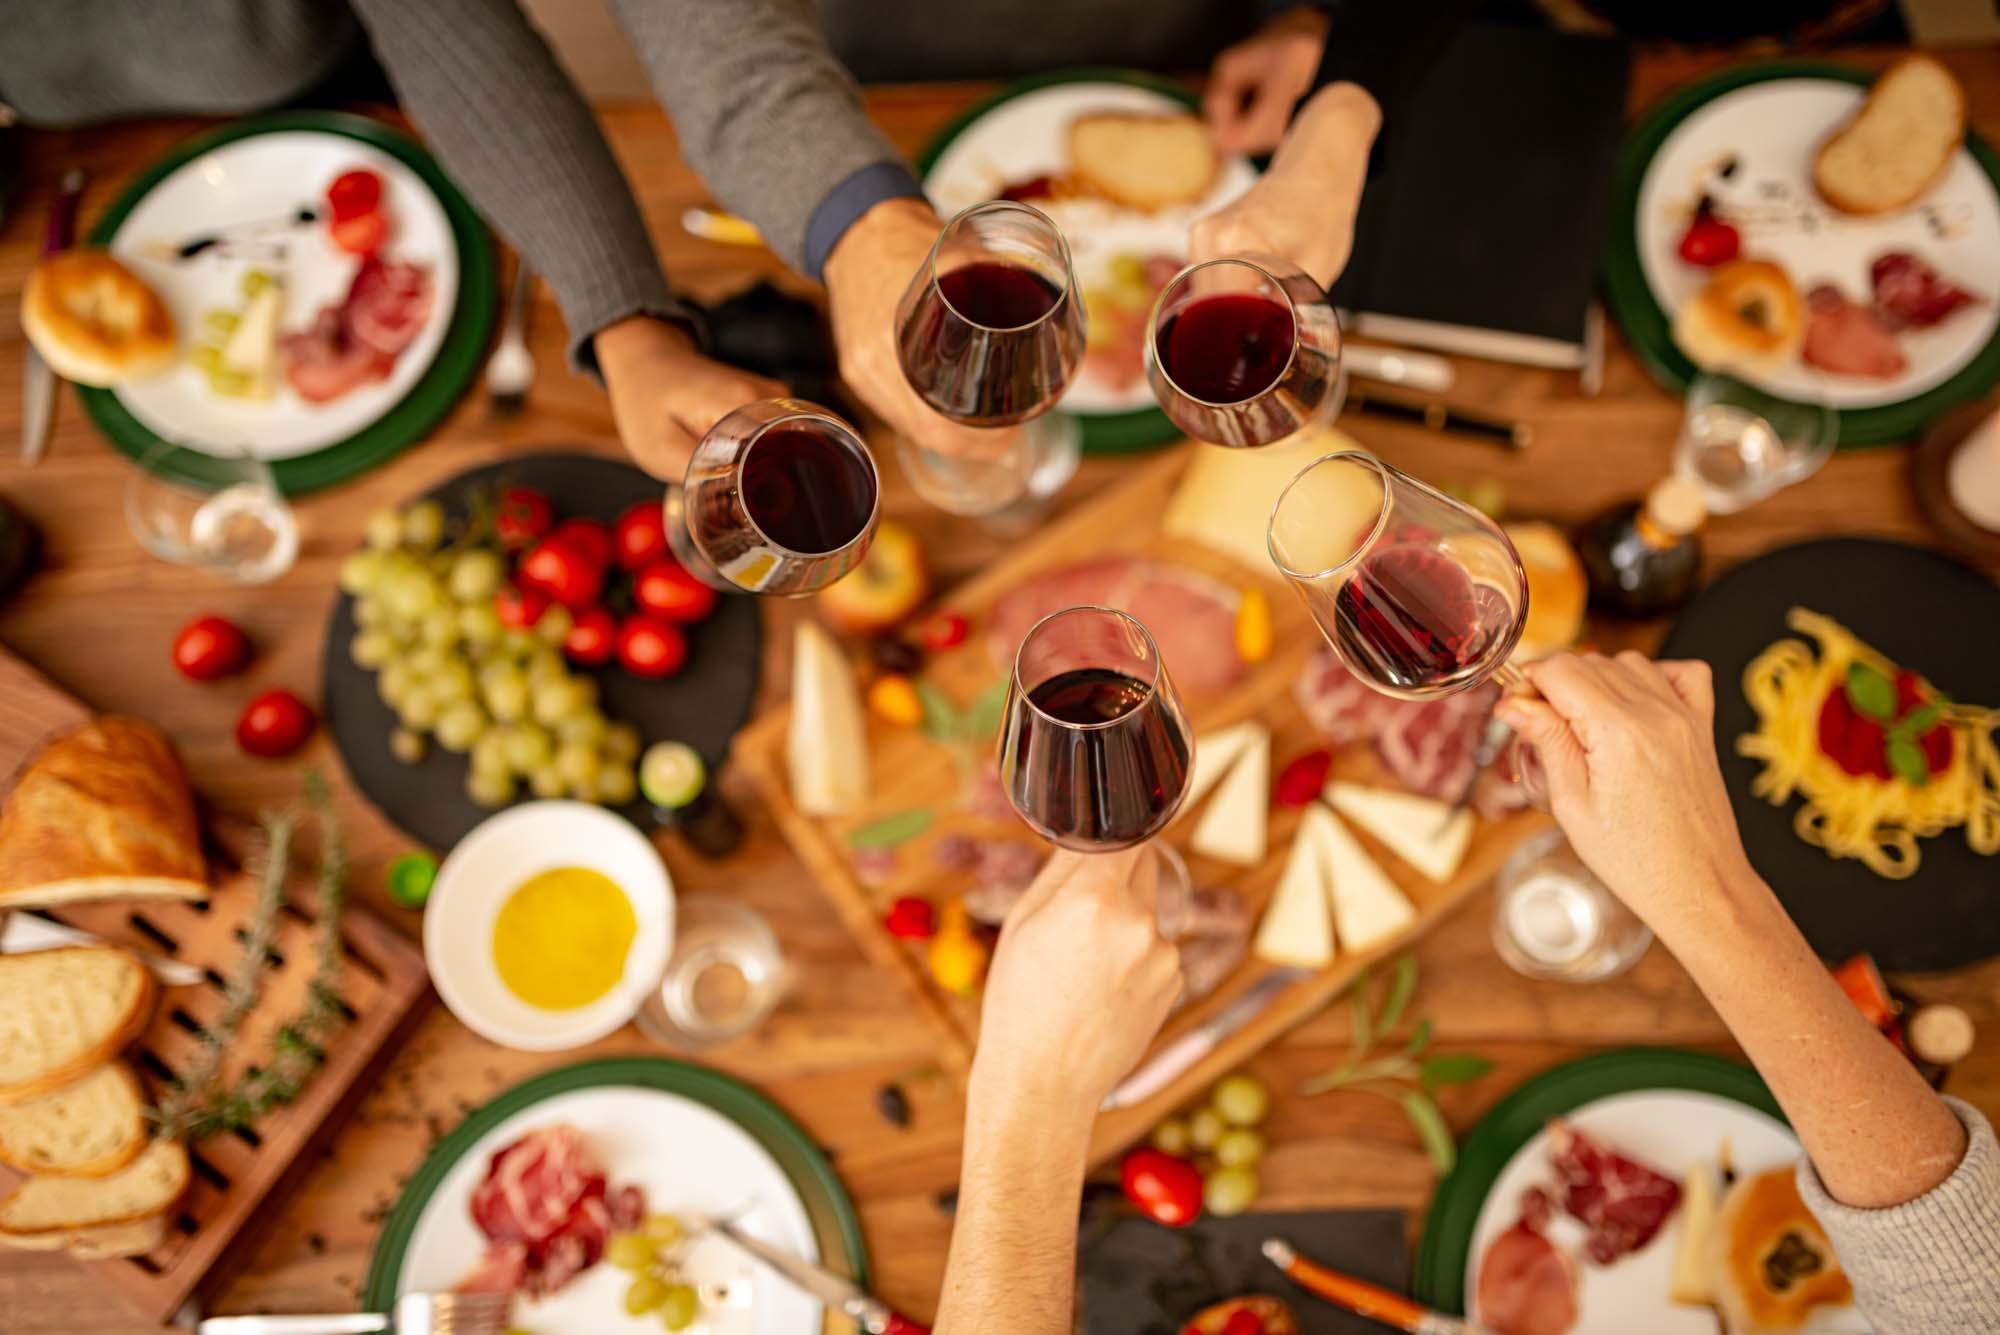 Cucina Amatoriale Formazione Manageriale a Salerno